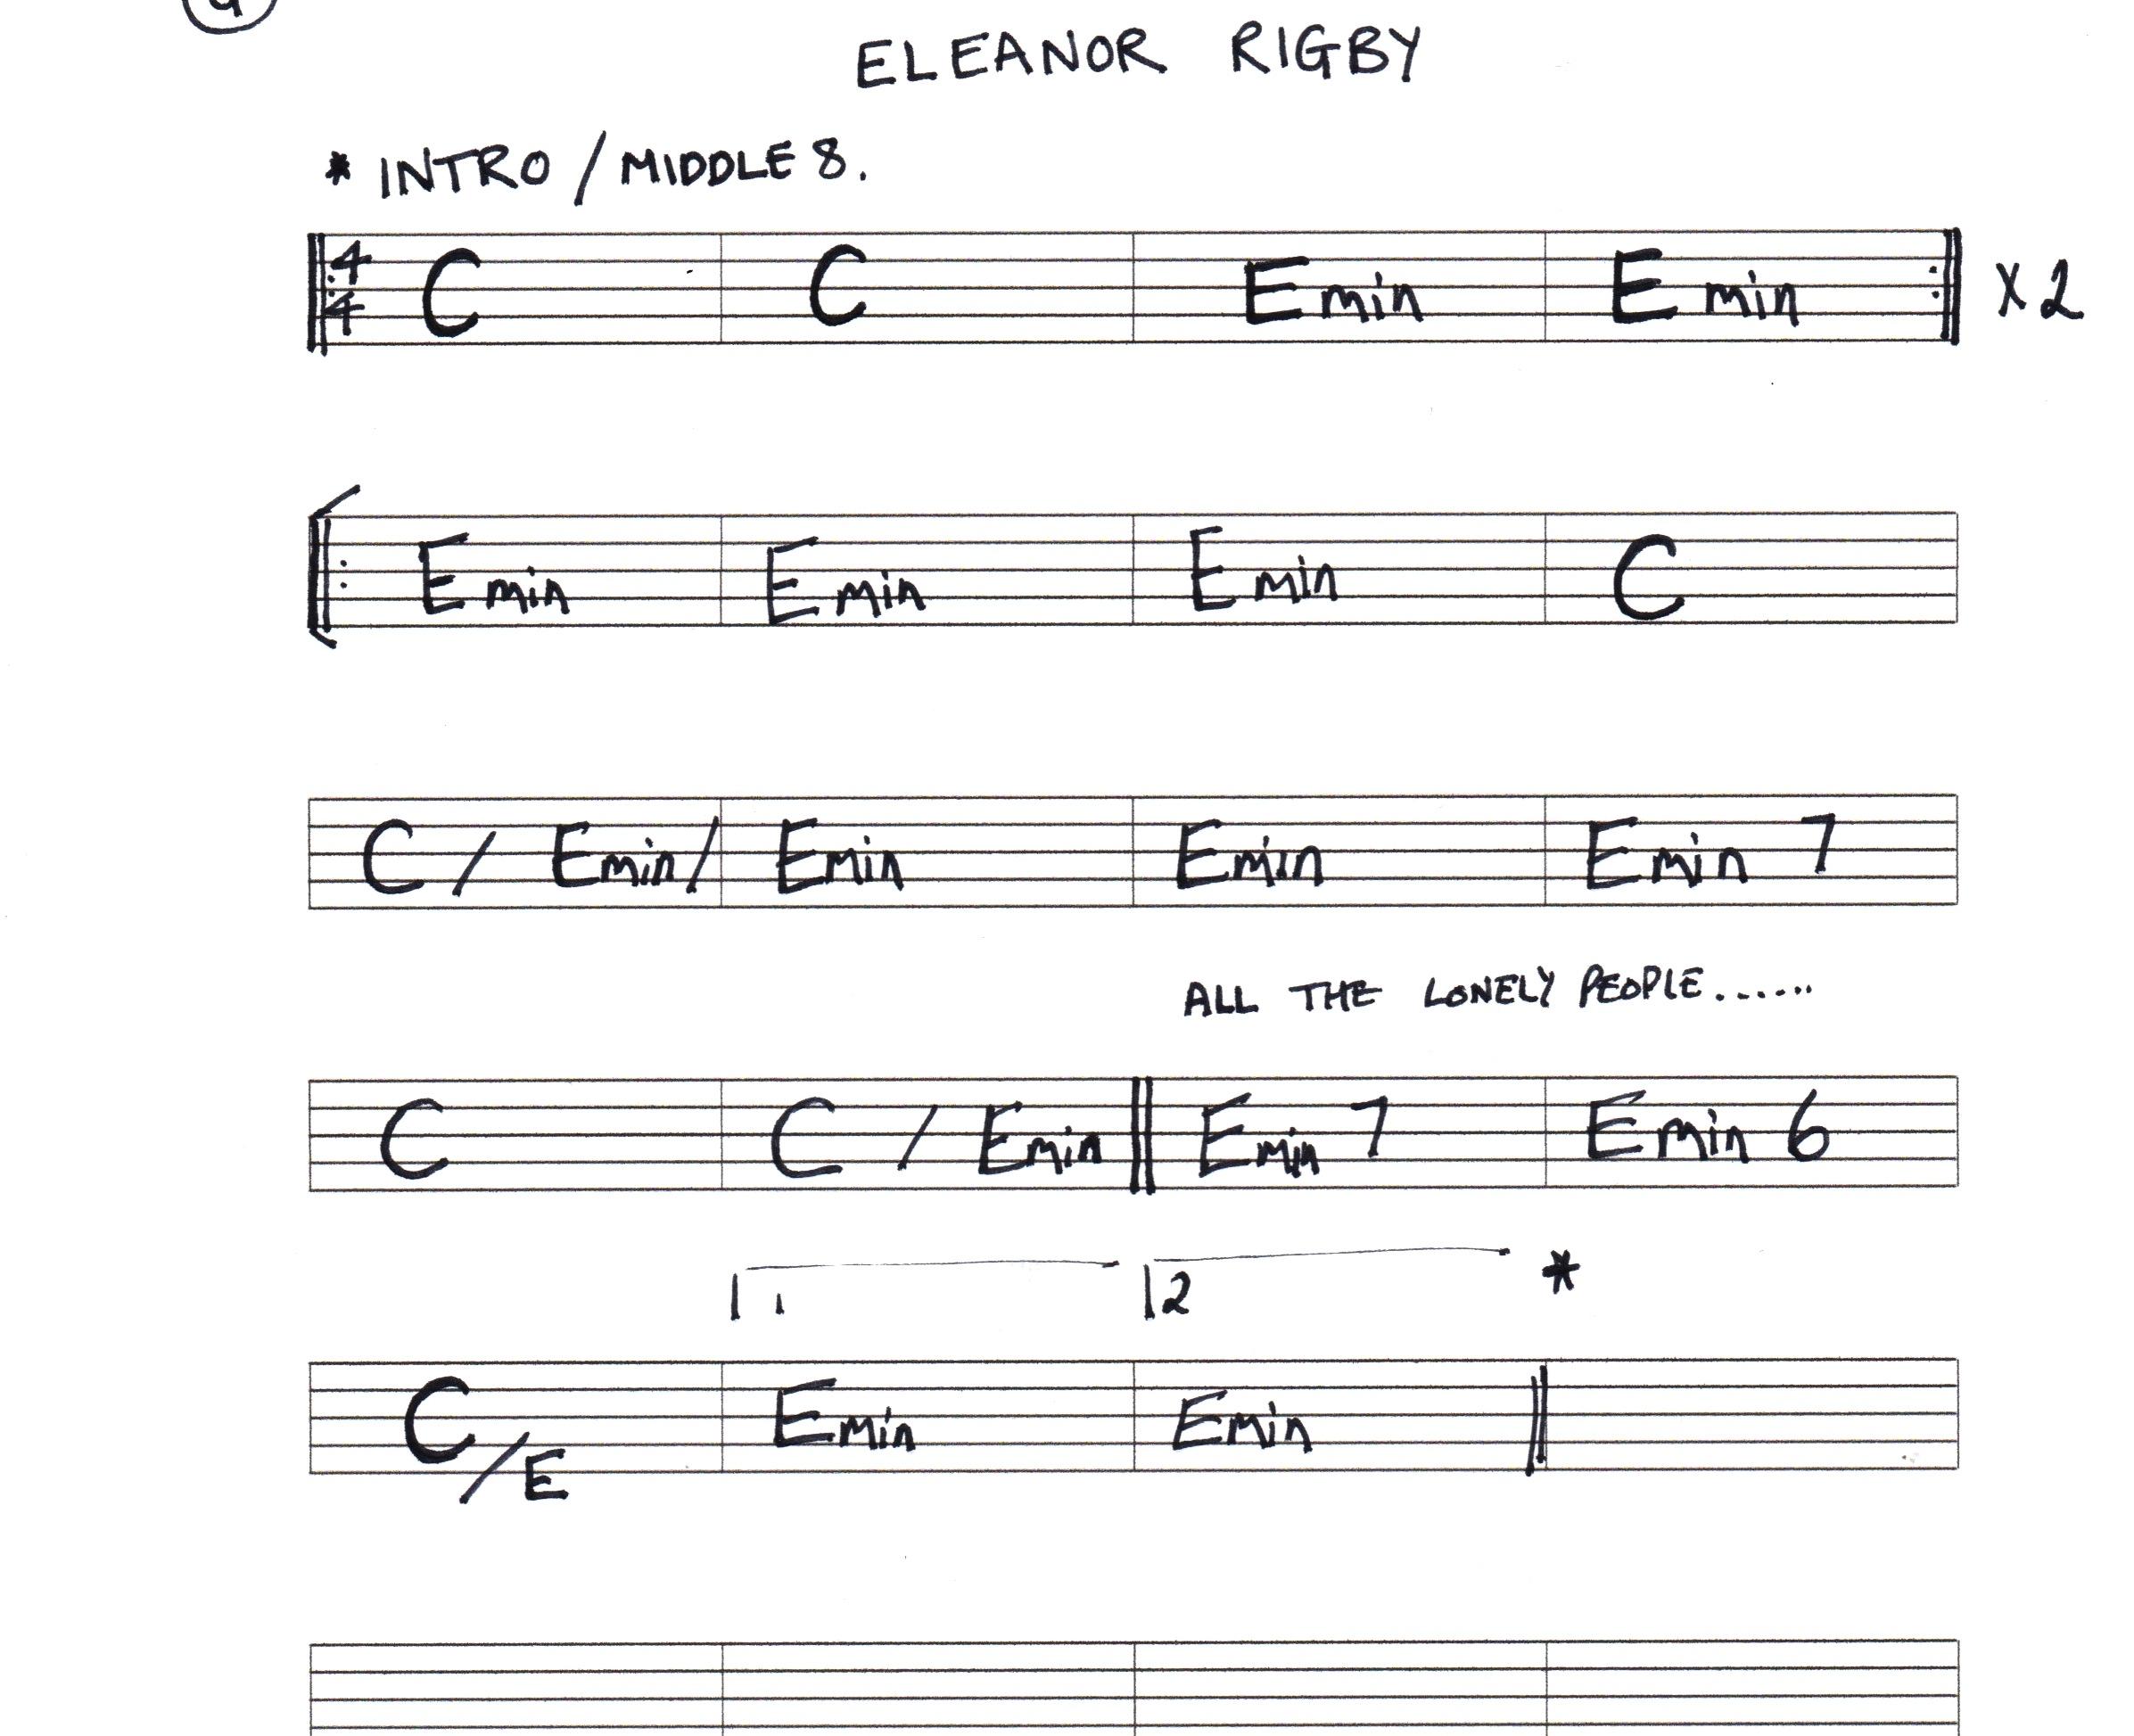 Eleanor Rigby Chord Chart   Key To Music